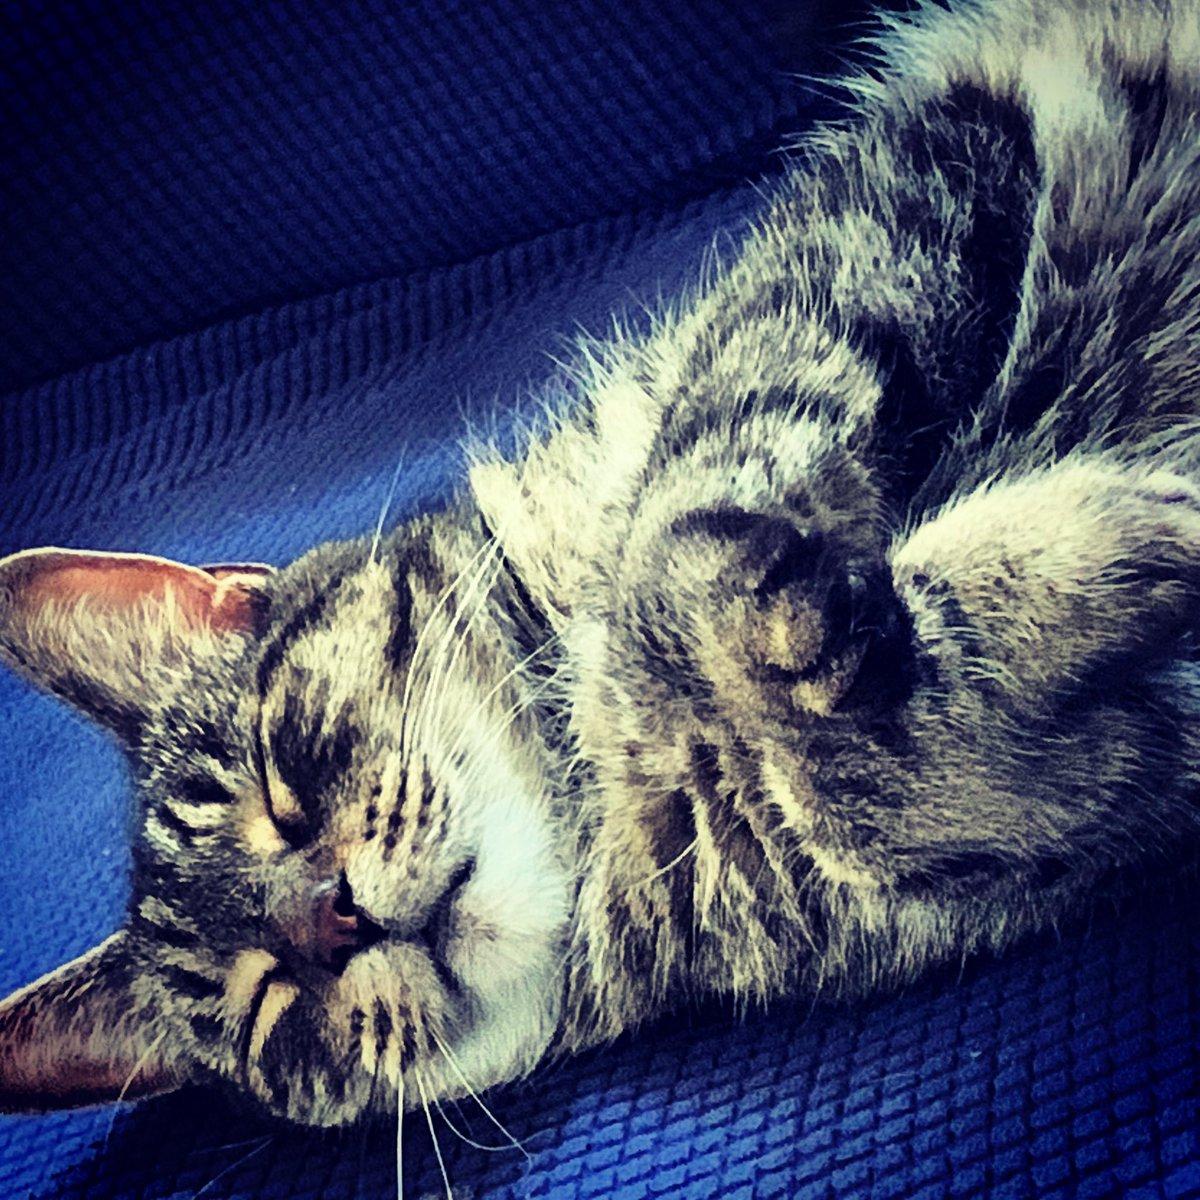 Happy #Caturday all 🐈 #cats #catsofinstagram 😀 💗 . . . . #theweekoninstagram #photosonmyphone #randomtags #cutepetclub #cutecats #catmom #catsofig #cats_of_instagram #instacute #instapic https://t.co/zrZCOjGMoh